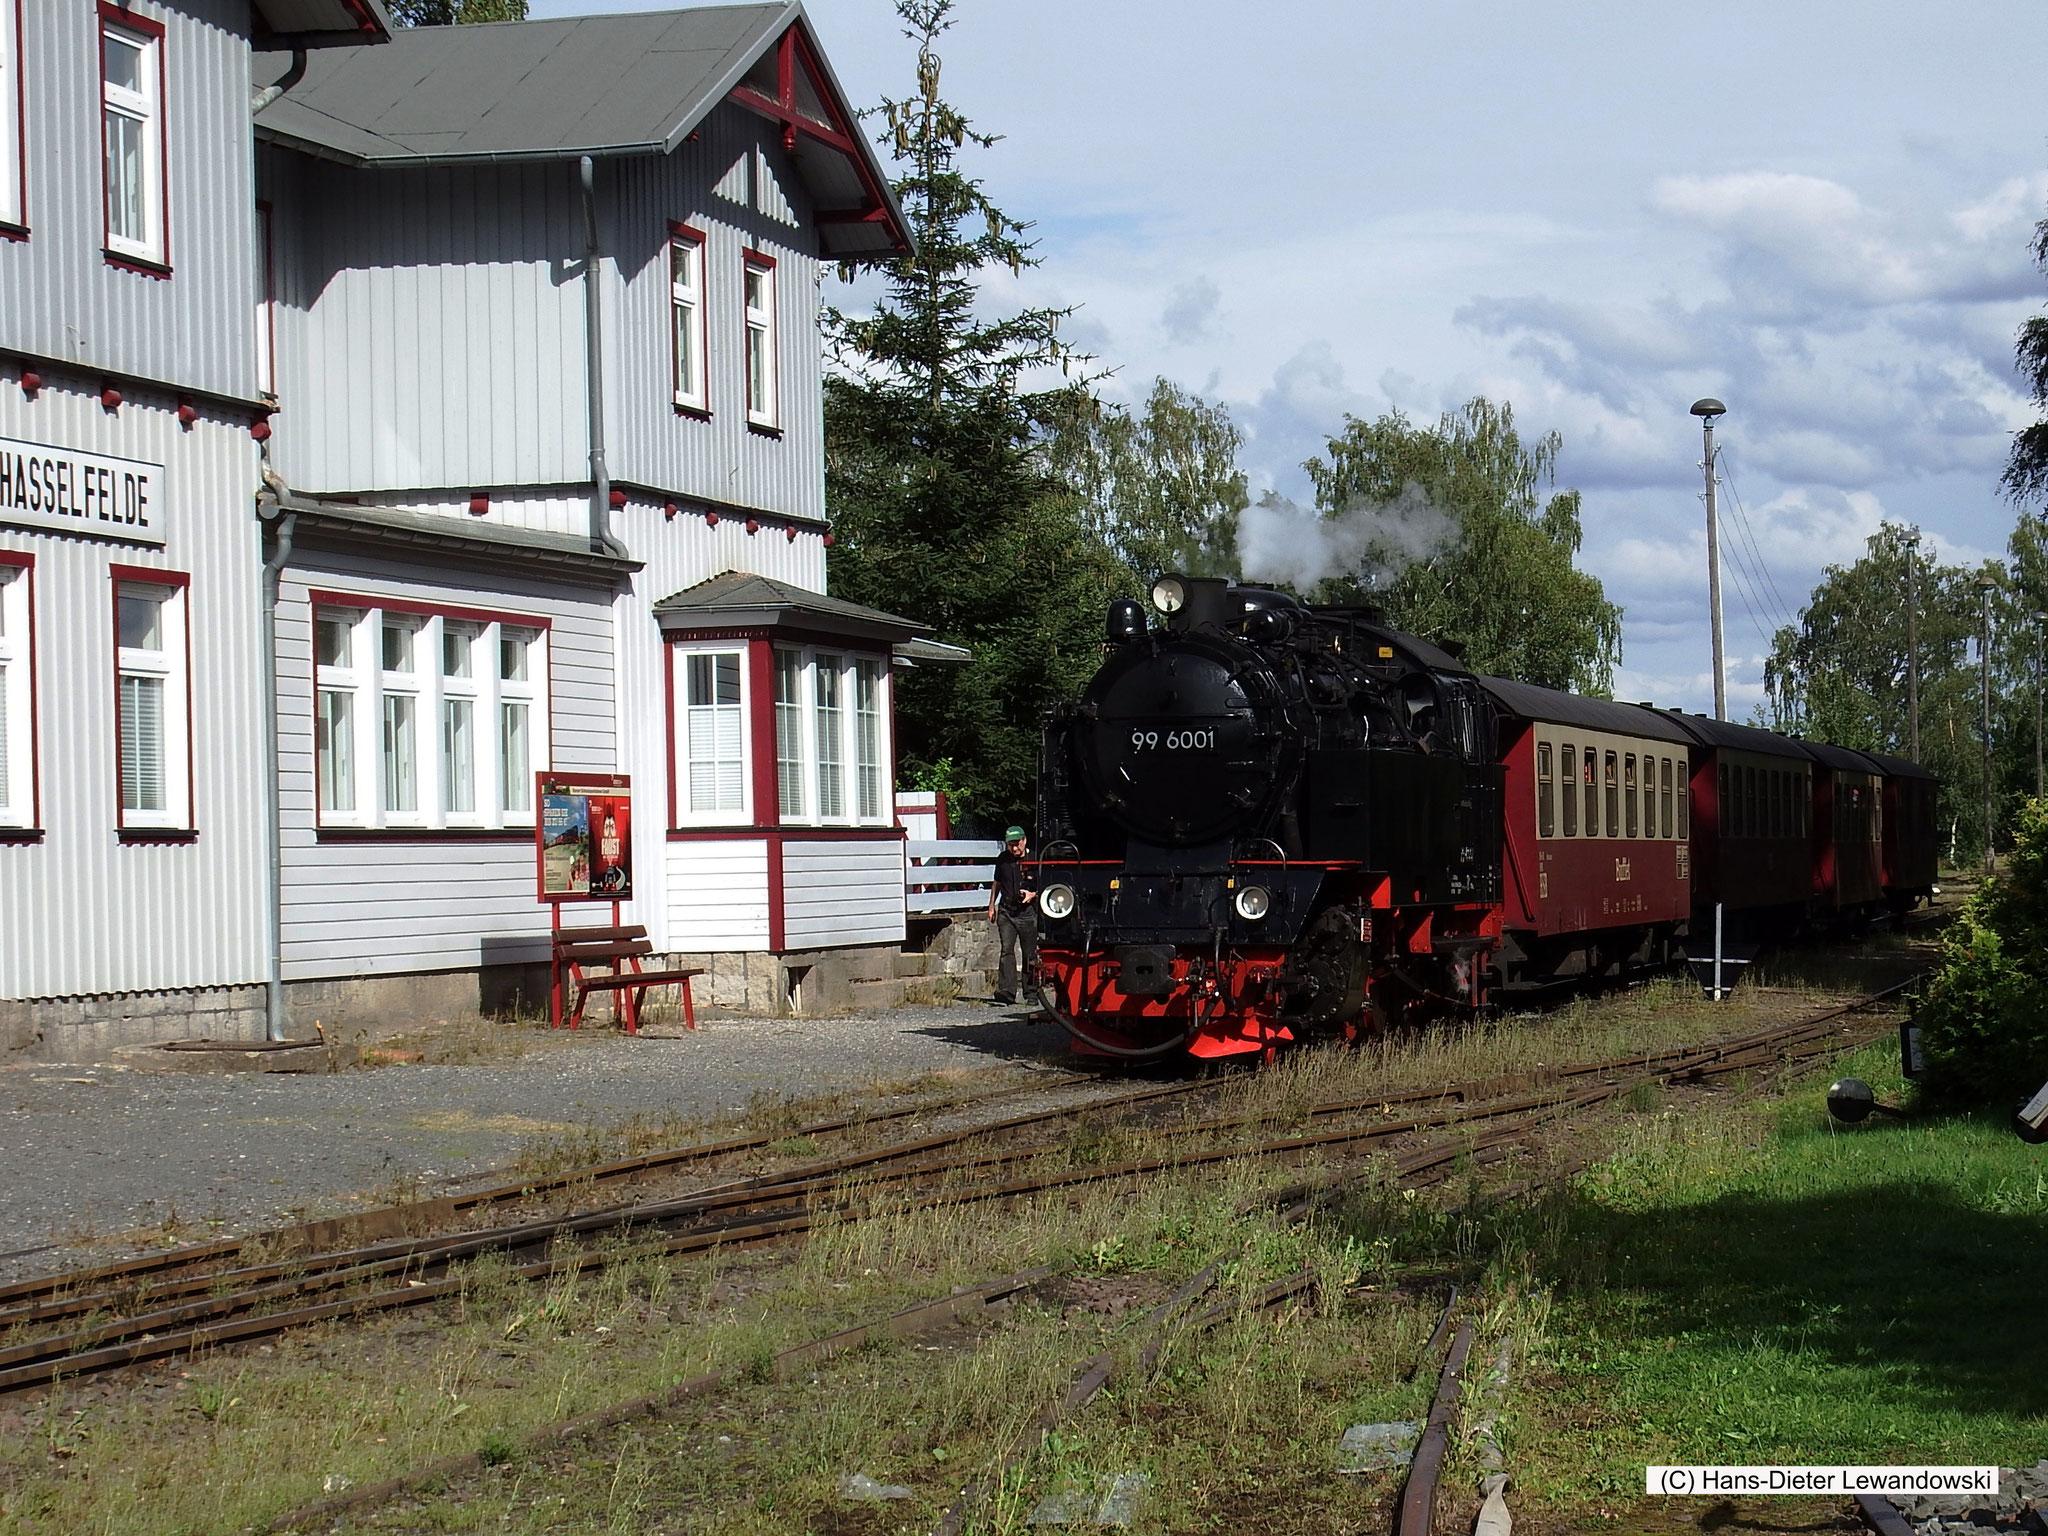 Bahnhof Hasselfelde